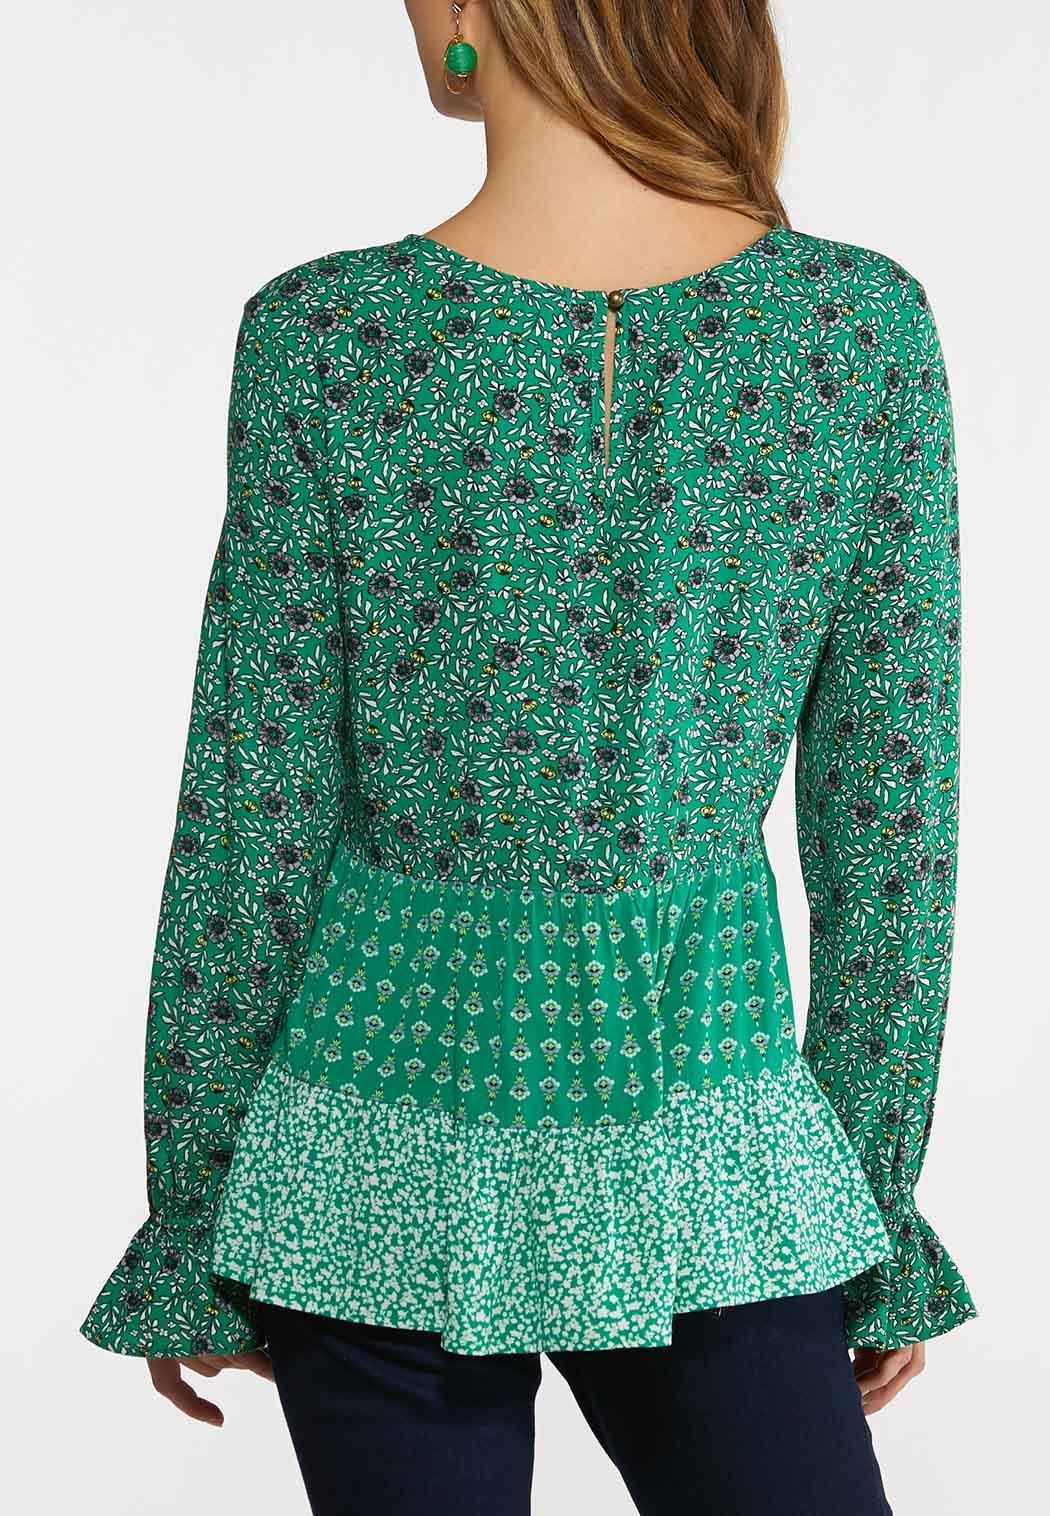 Green Mixed Floral Top (Item #44224665)